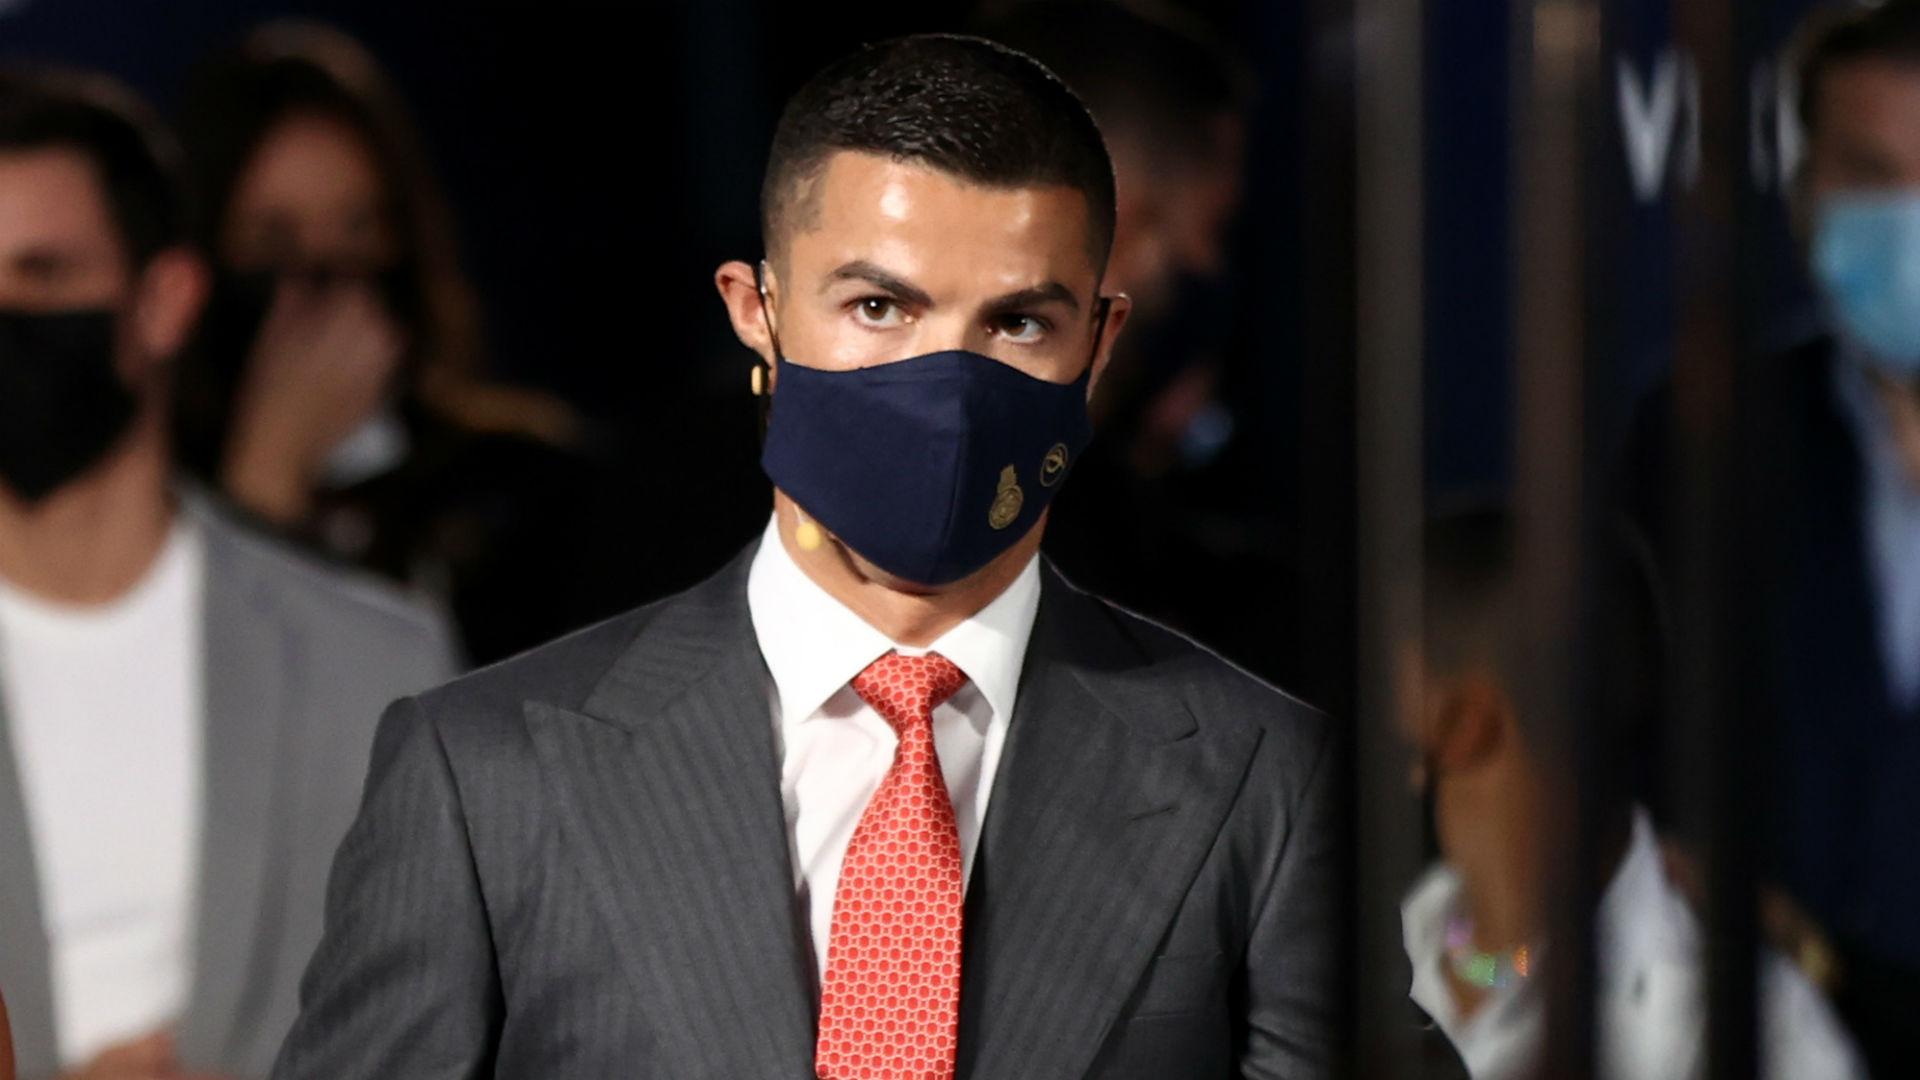 Video: Ronaldo named 'Player of the Century' at Globe Soccer Awards